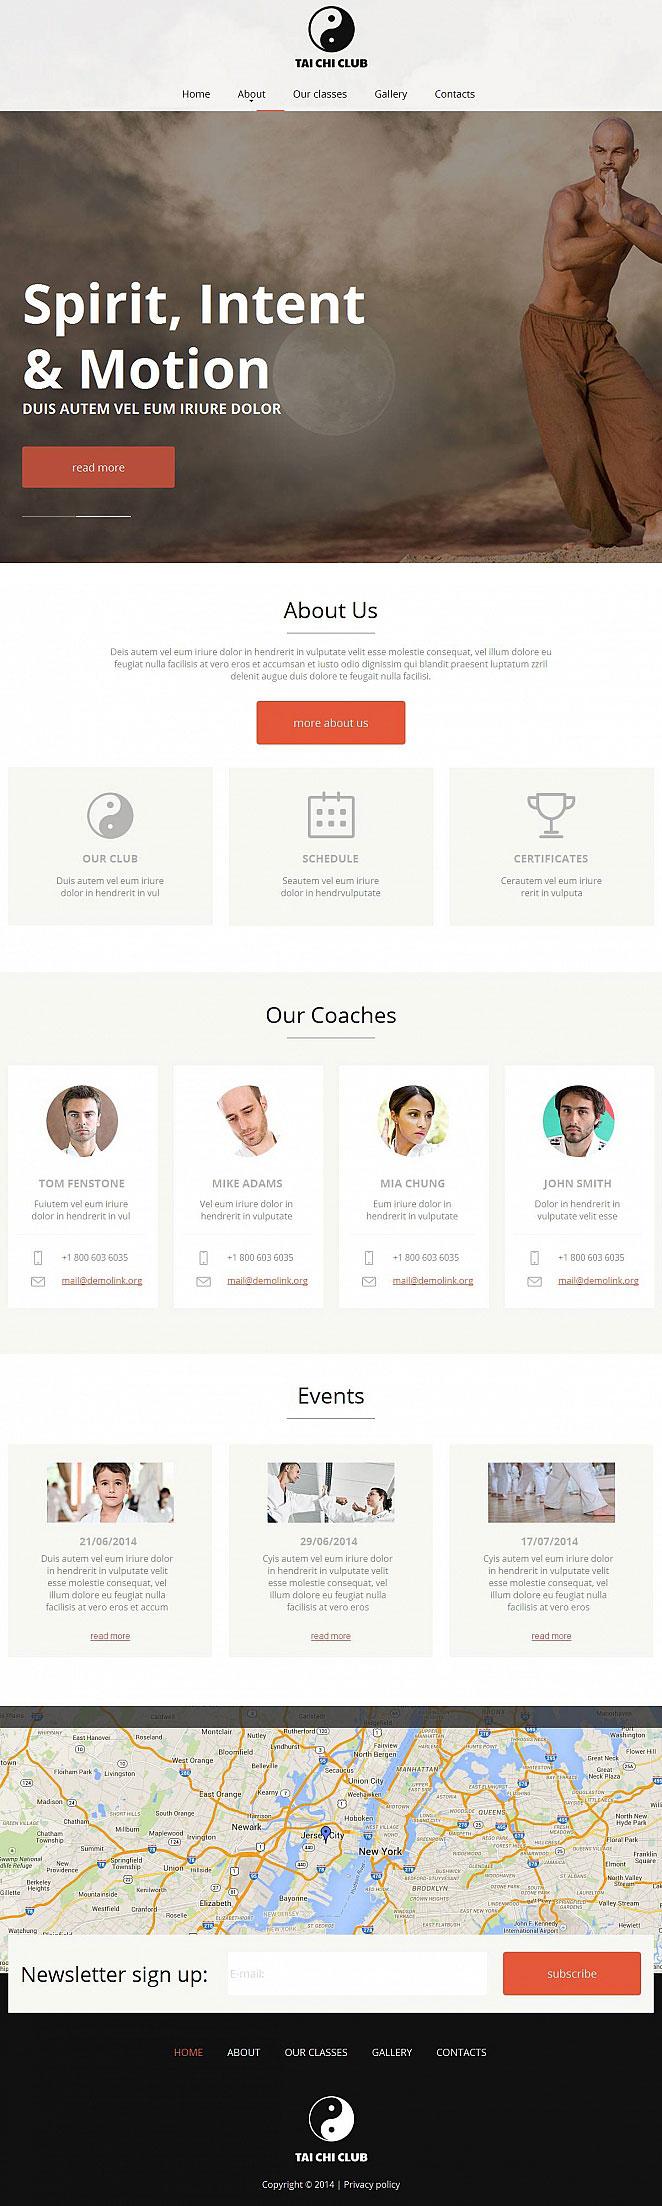 Tai Chi Website Template with Minimalist Design - image